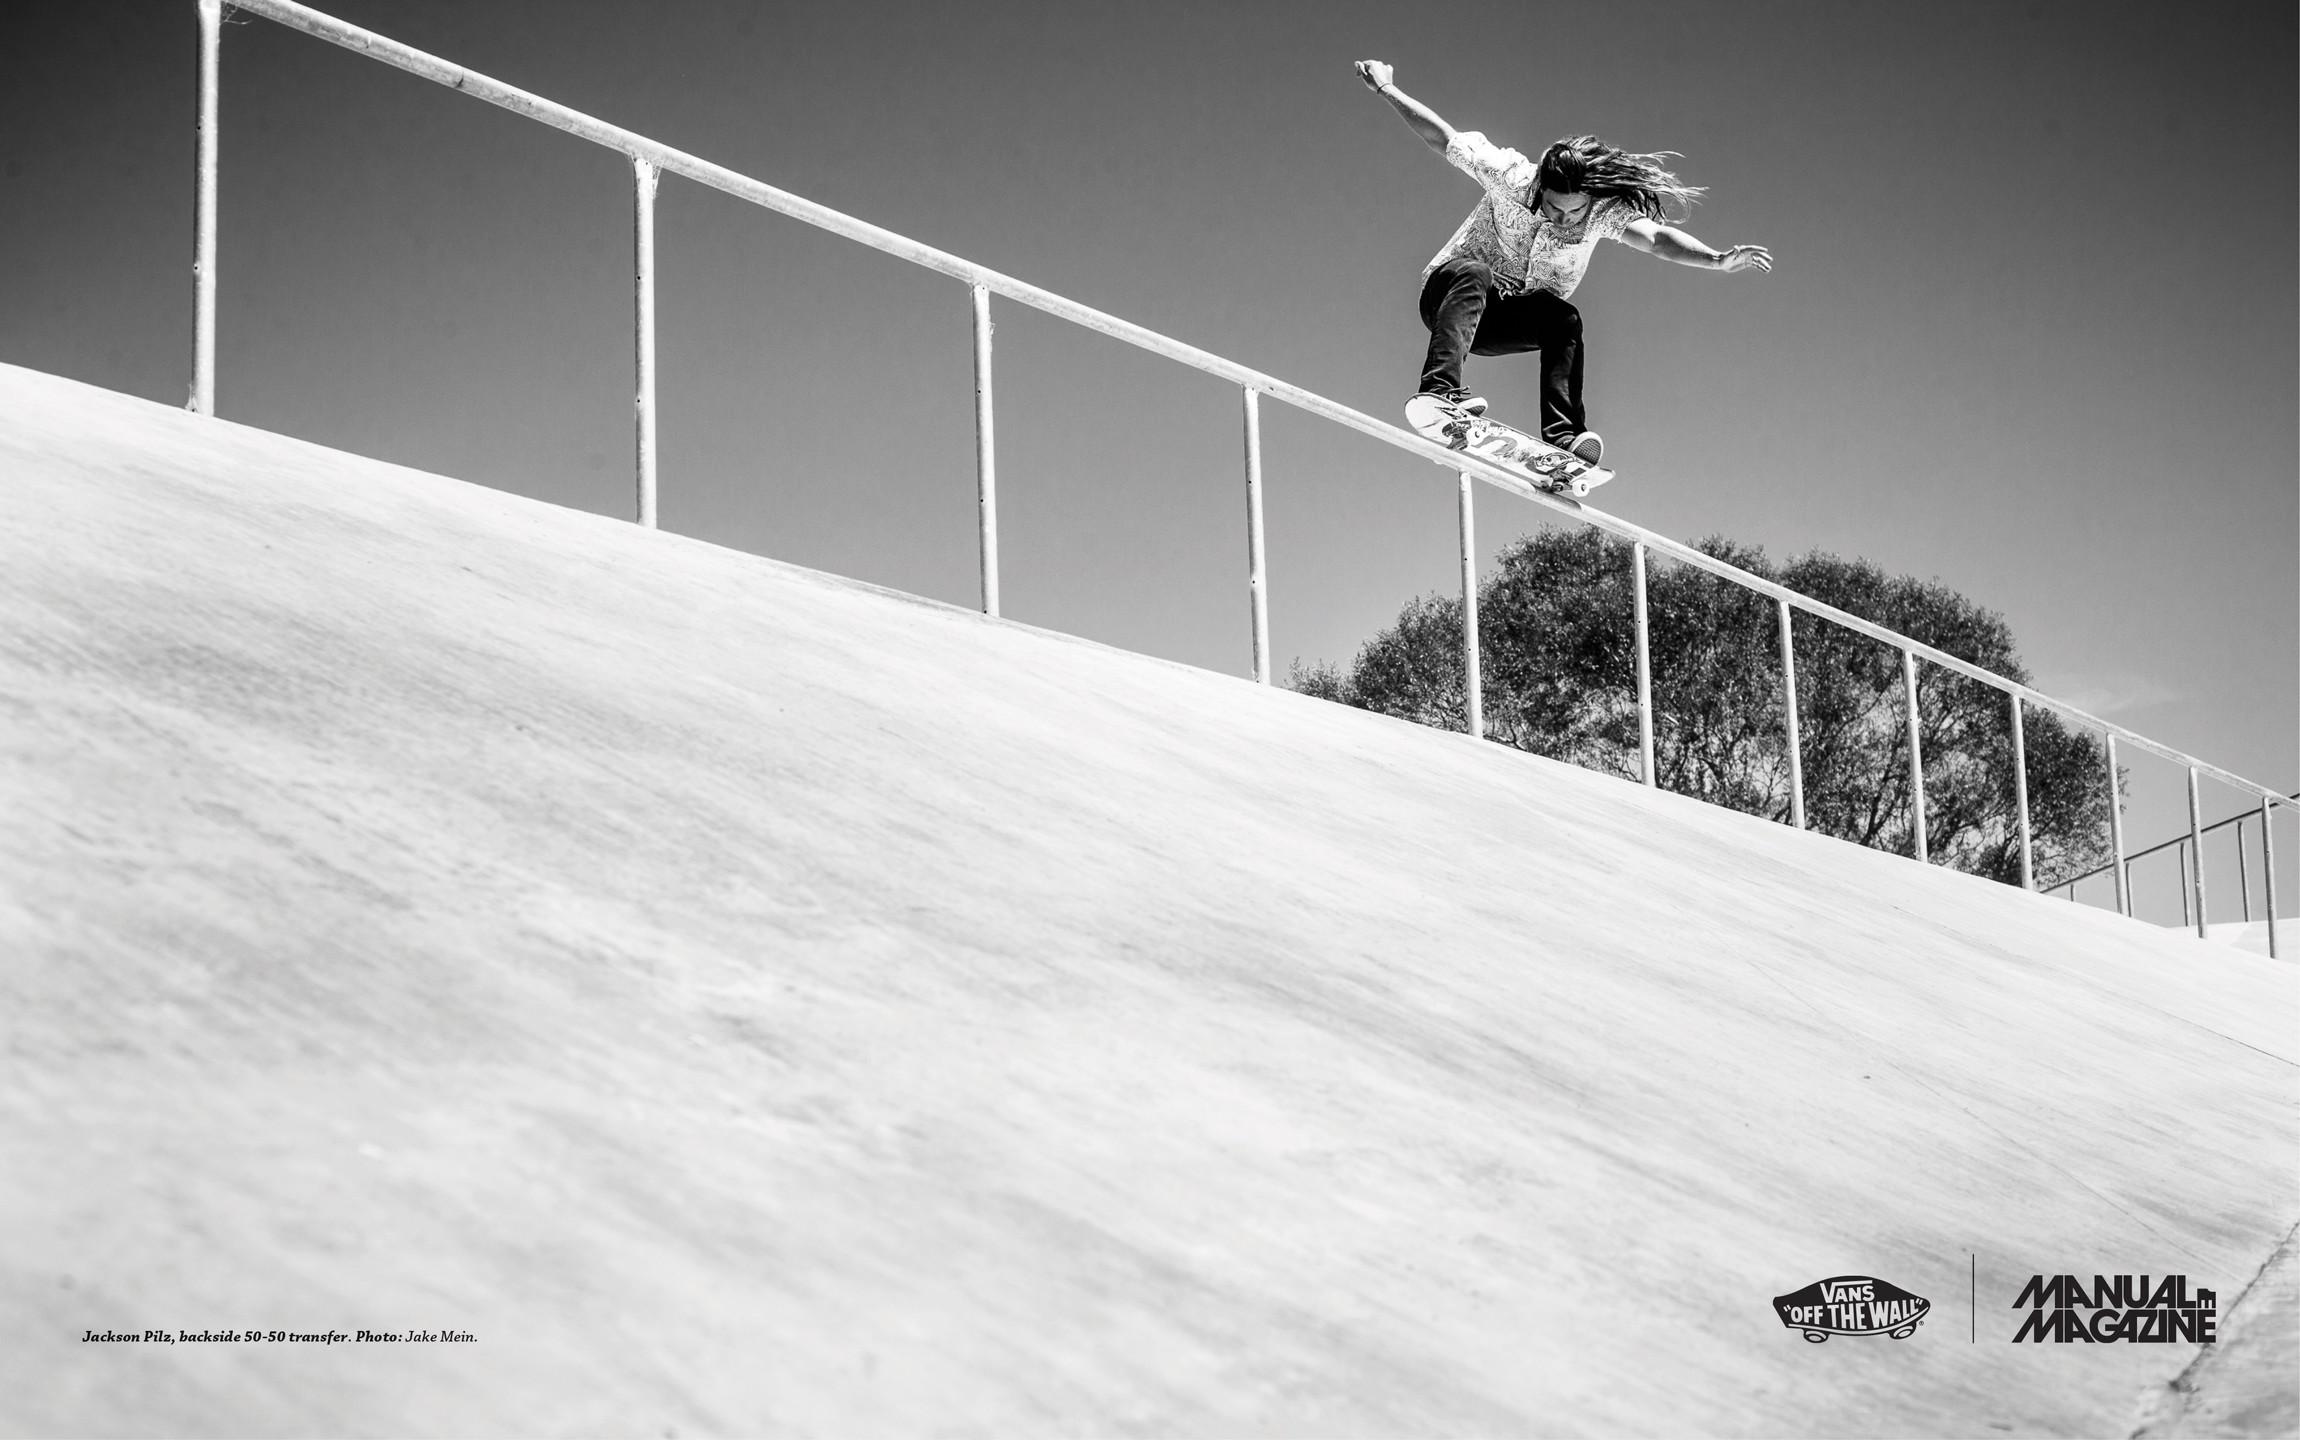 Vans Skateboard wallpaper high definition